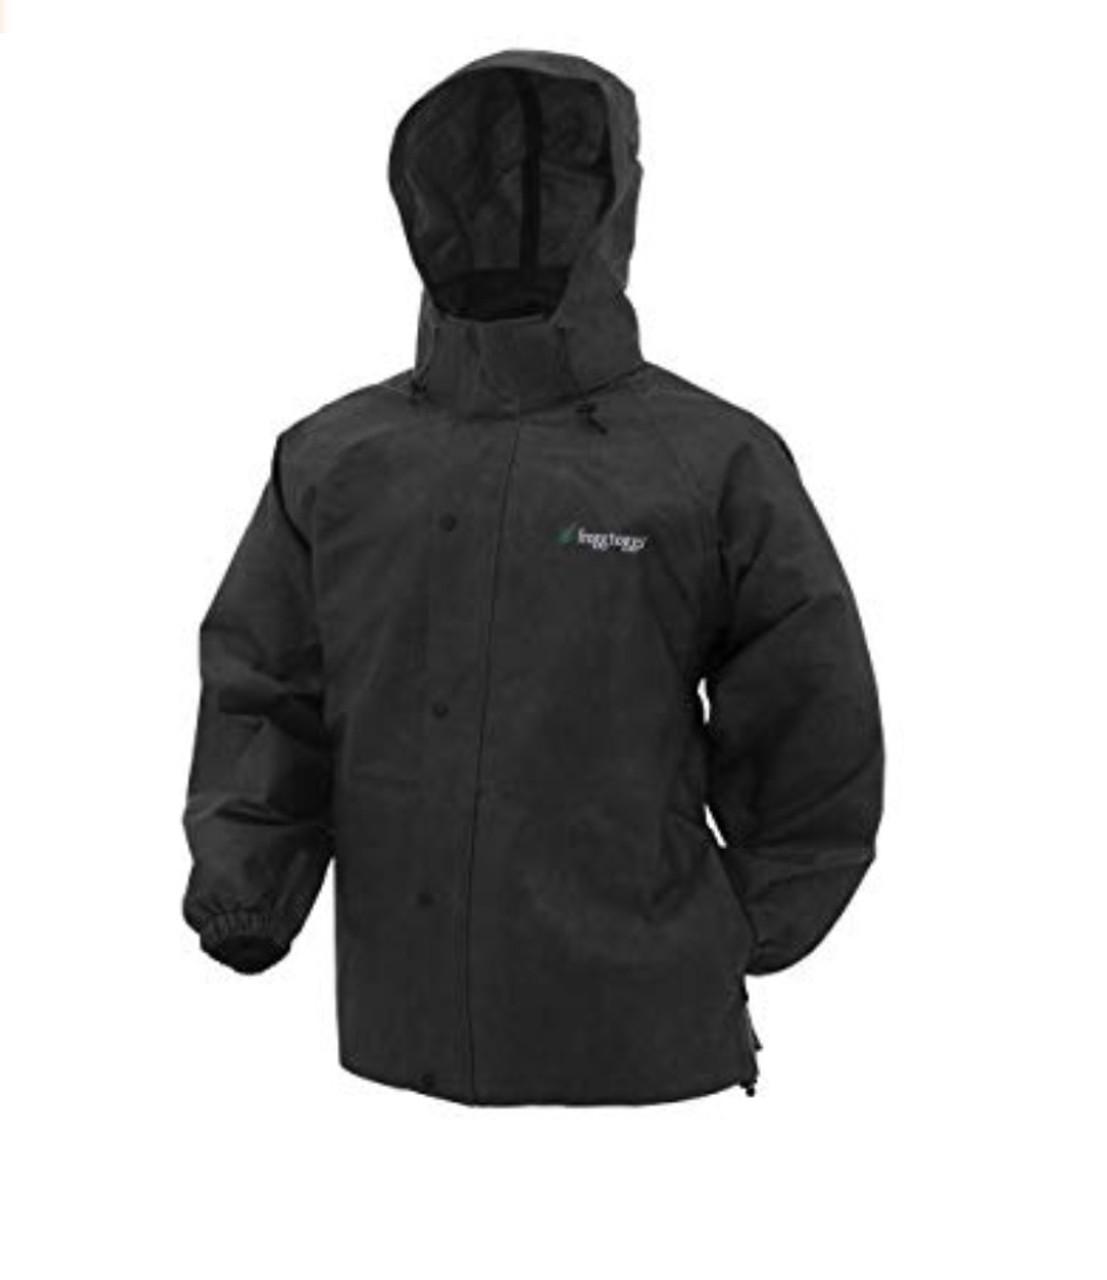 Frogg Toggs Men's Pro Action Rain Jacket X-Large - Black - PA63123-01XL